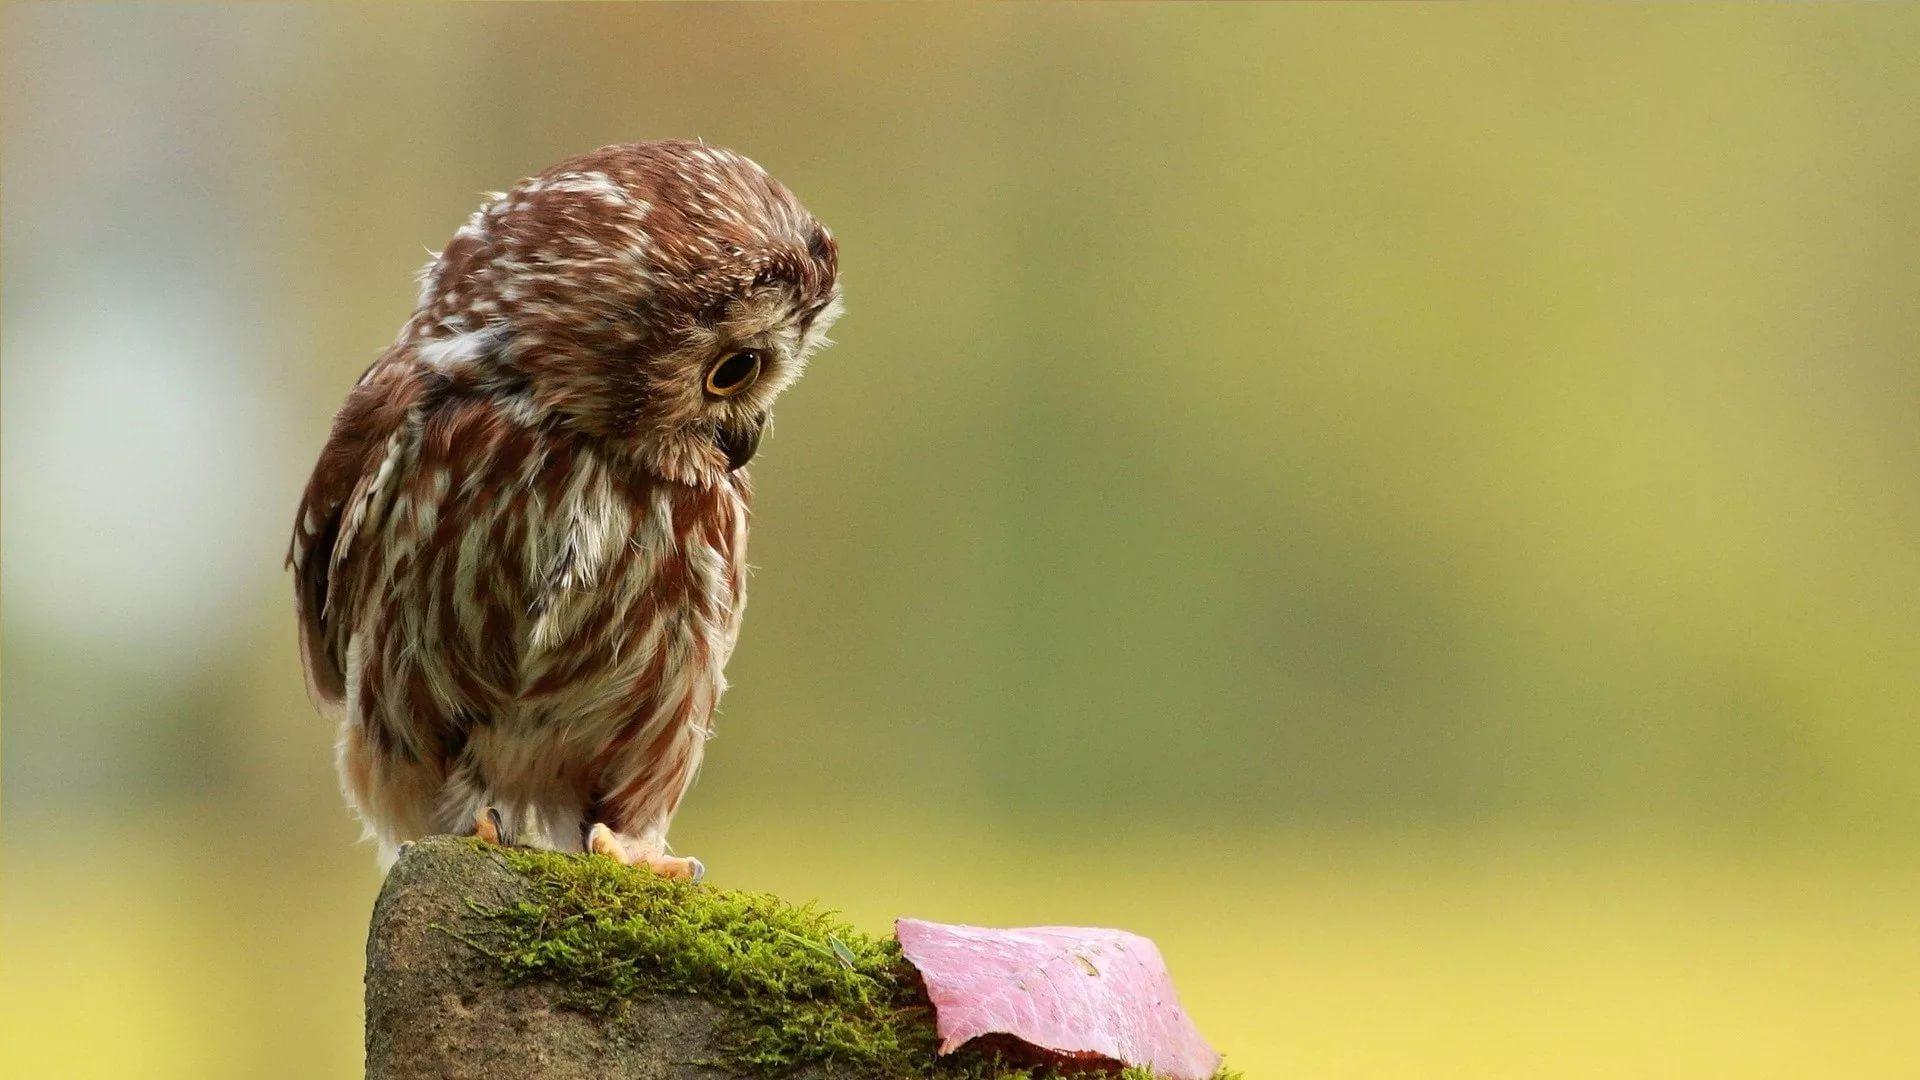 Cute Owl PC Wallpaper HD